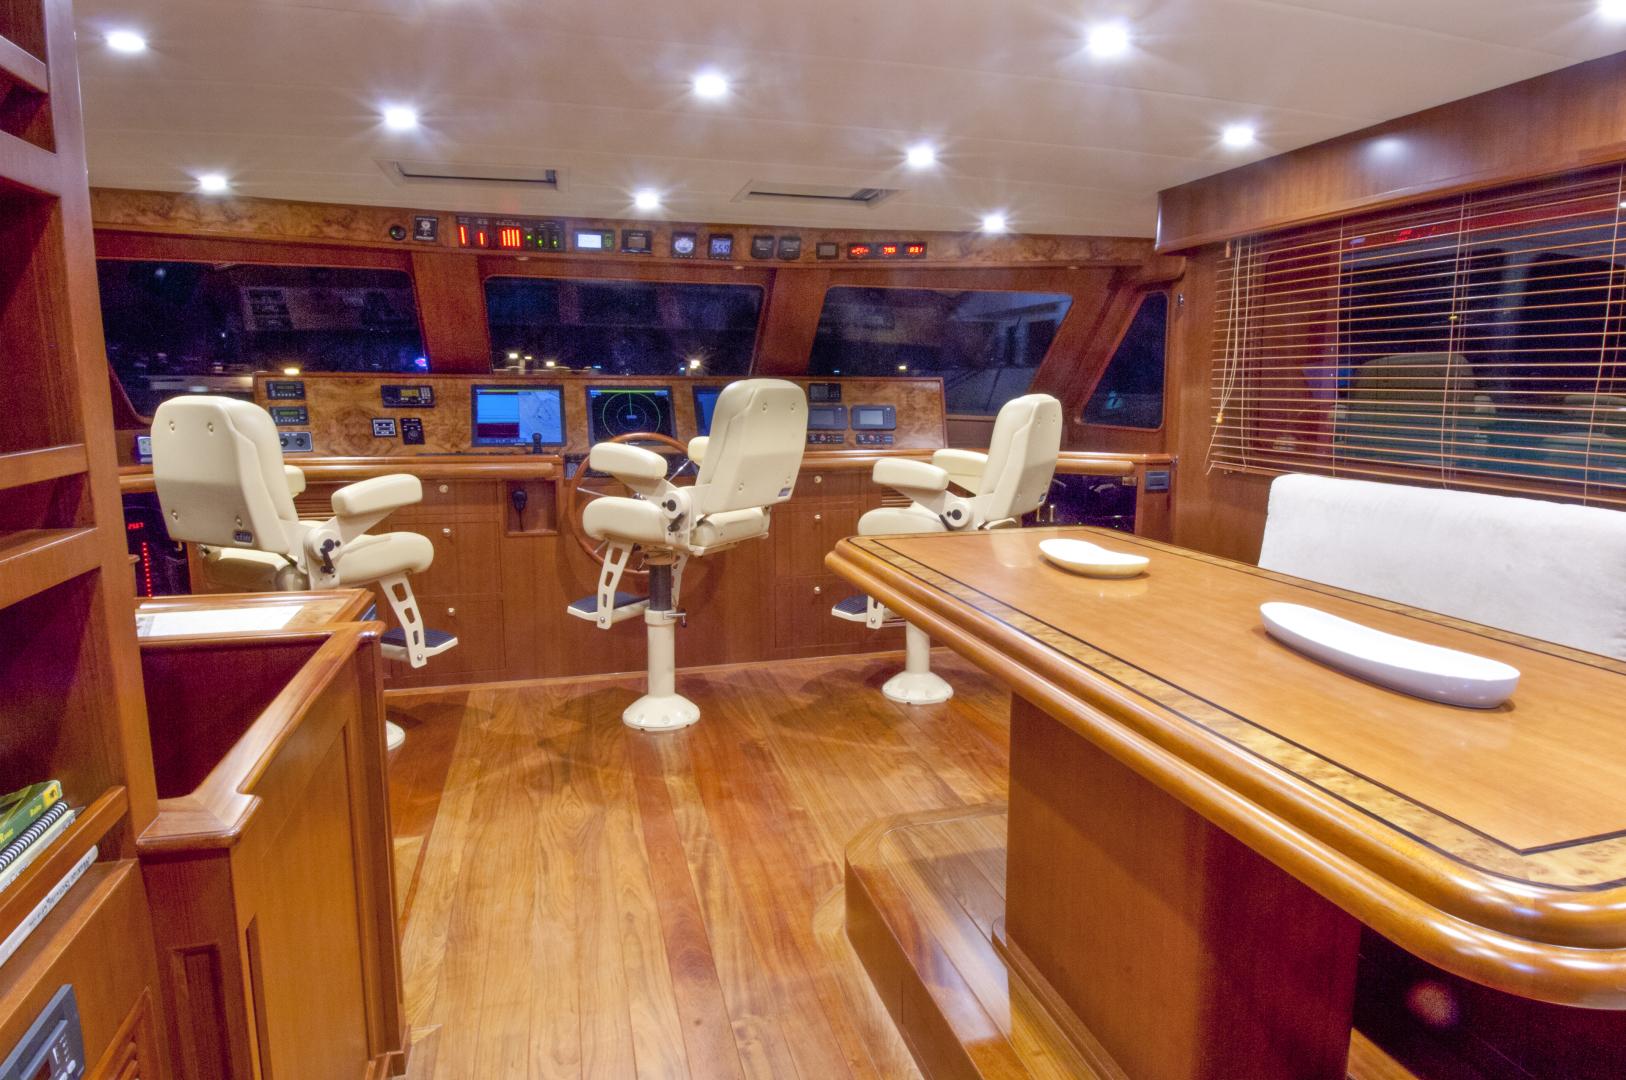 Offshore Yachts-Motoryacht 2020 -United States-1117788   Thumbnail